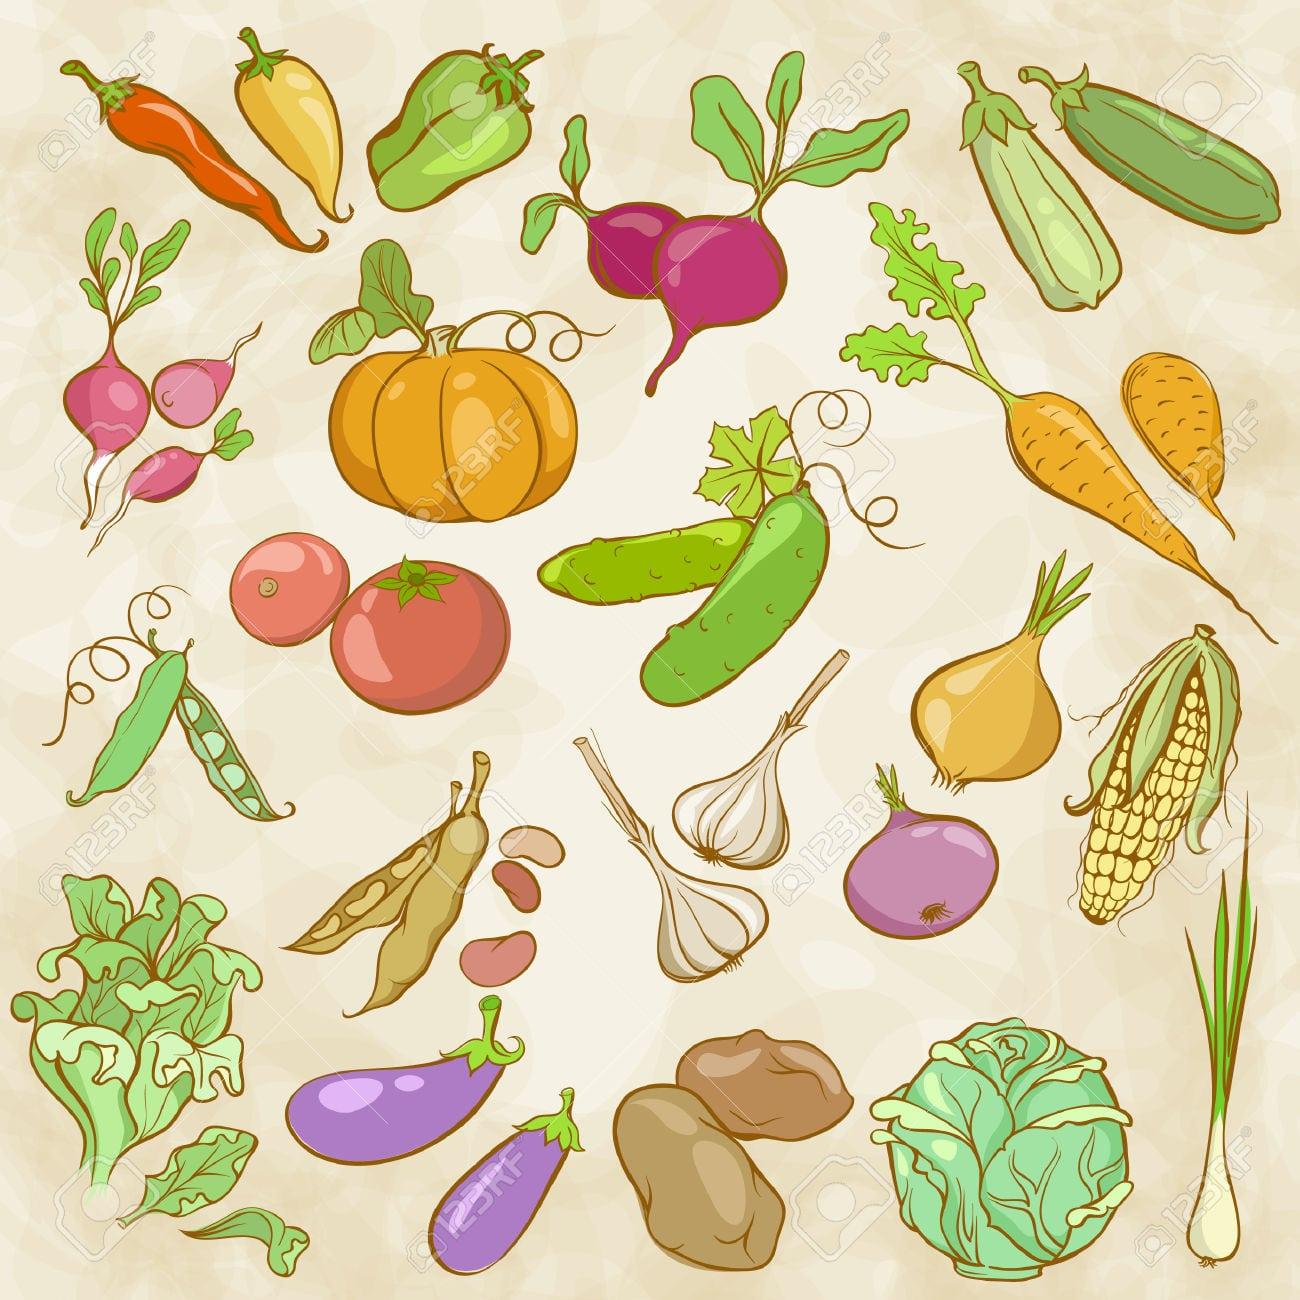 Desenho De Contornos Coloridos De Legumes Royalty Free Cliparts